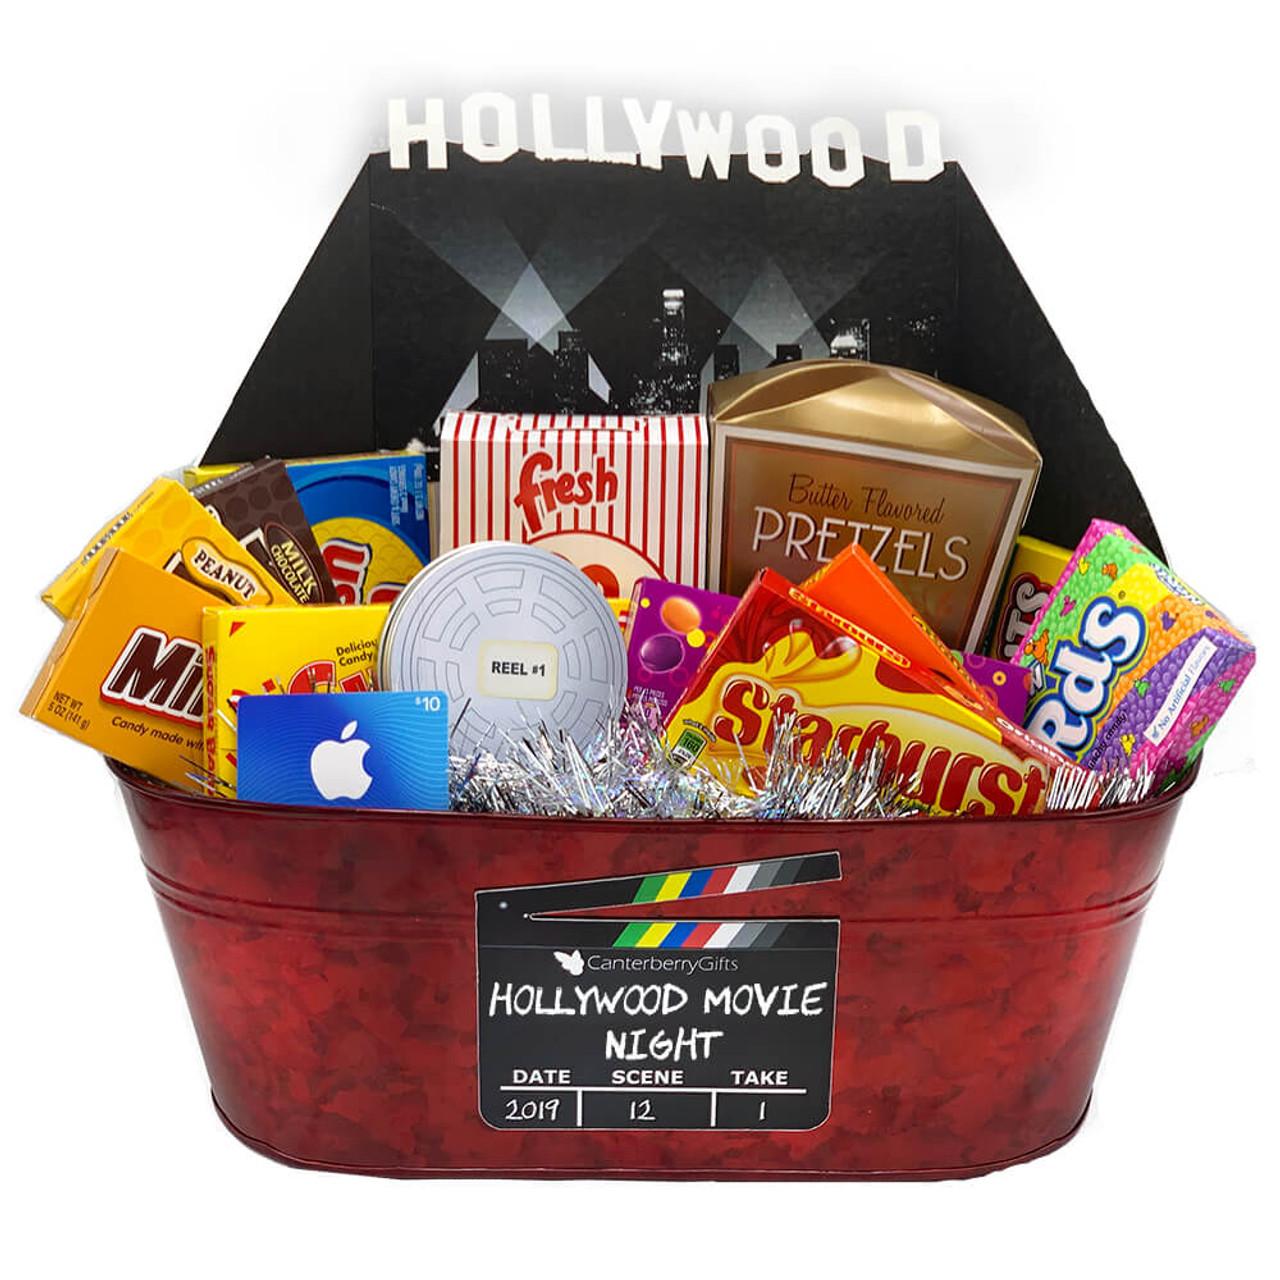 Hollywood Movie Gift Basket